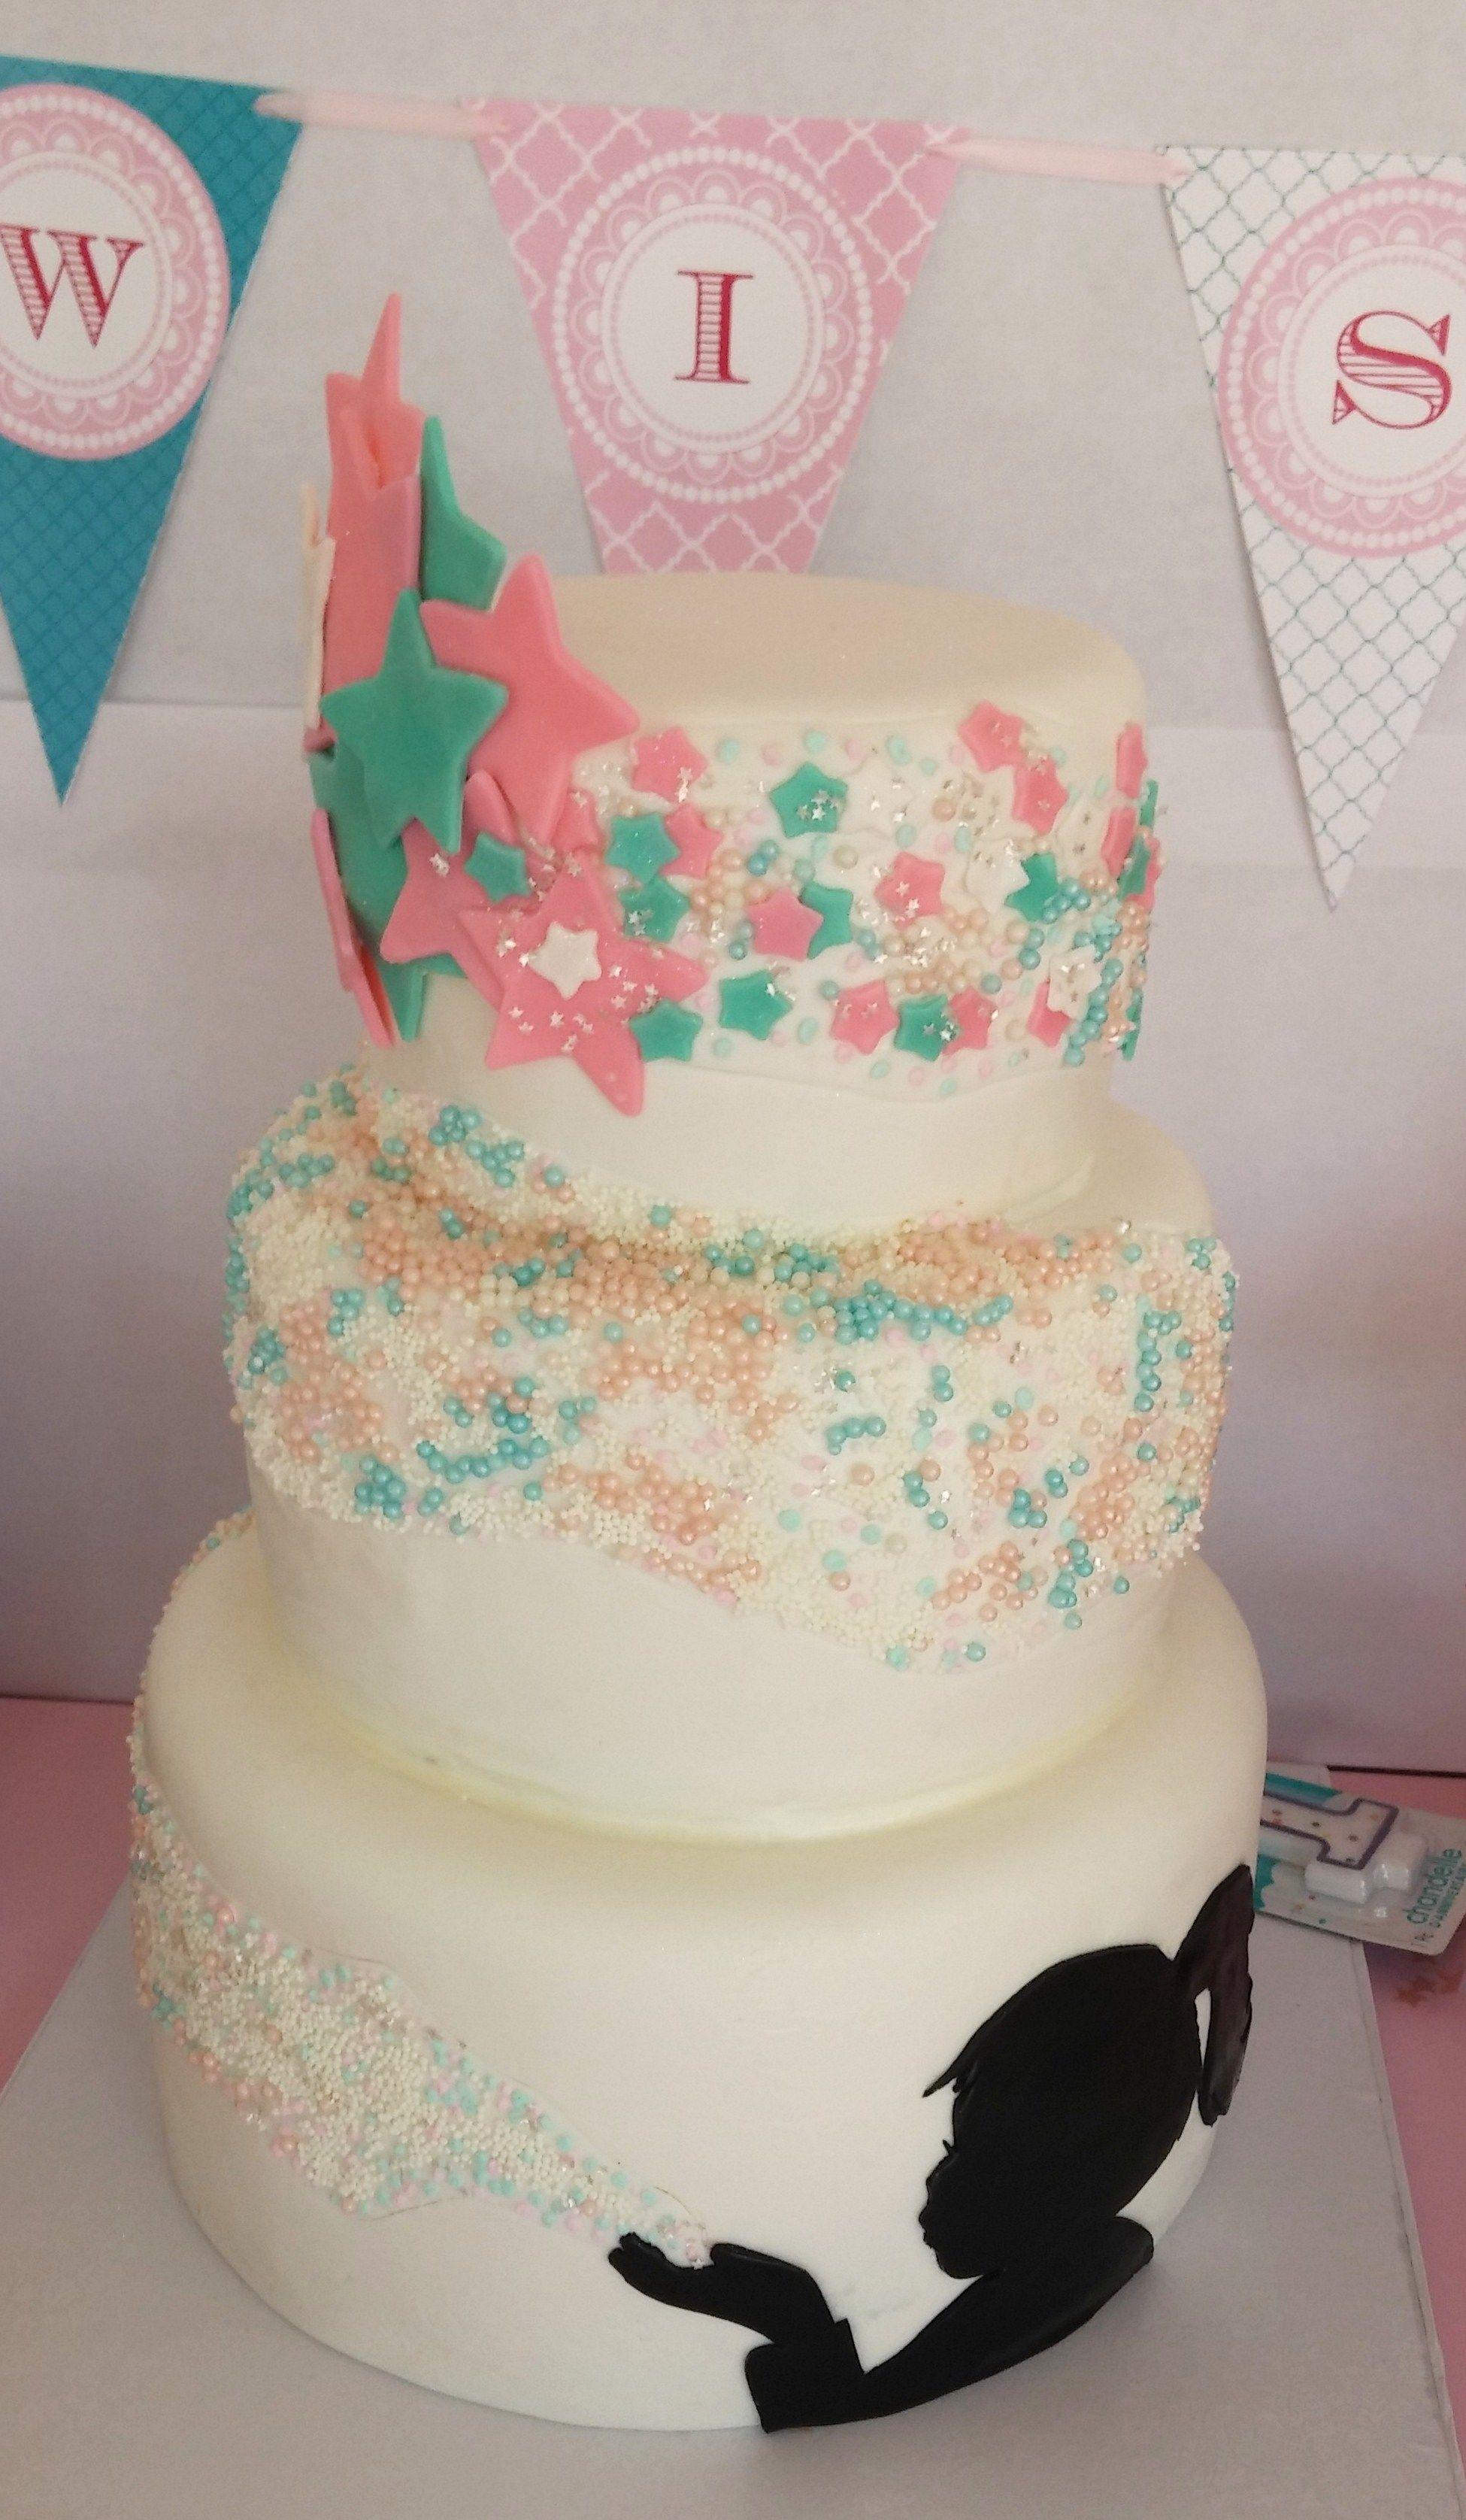 my wish upon a star cake